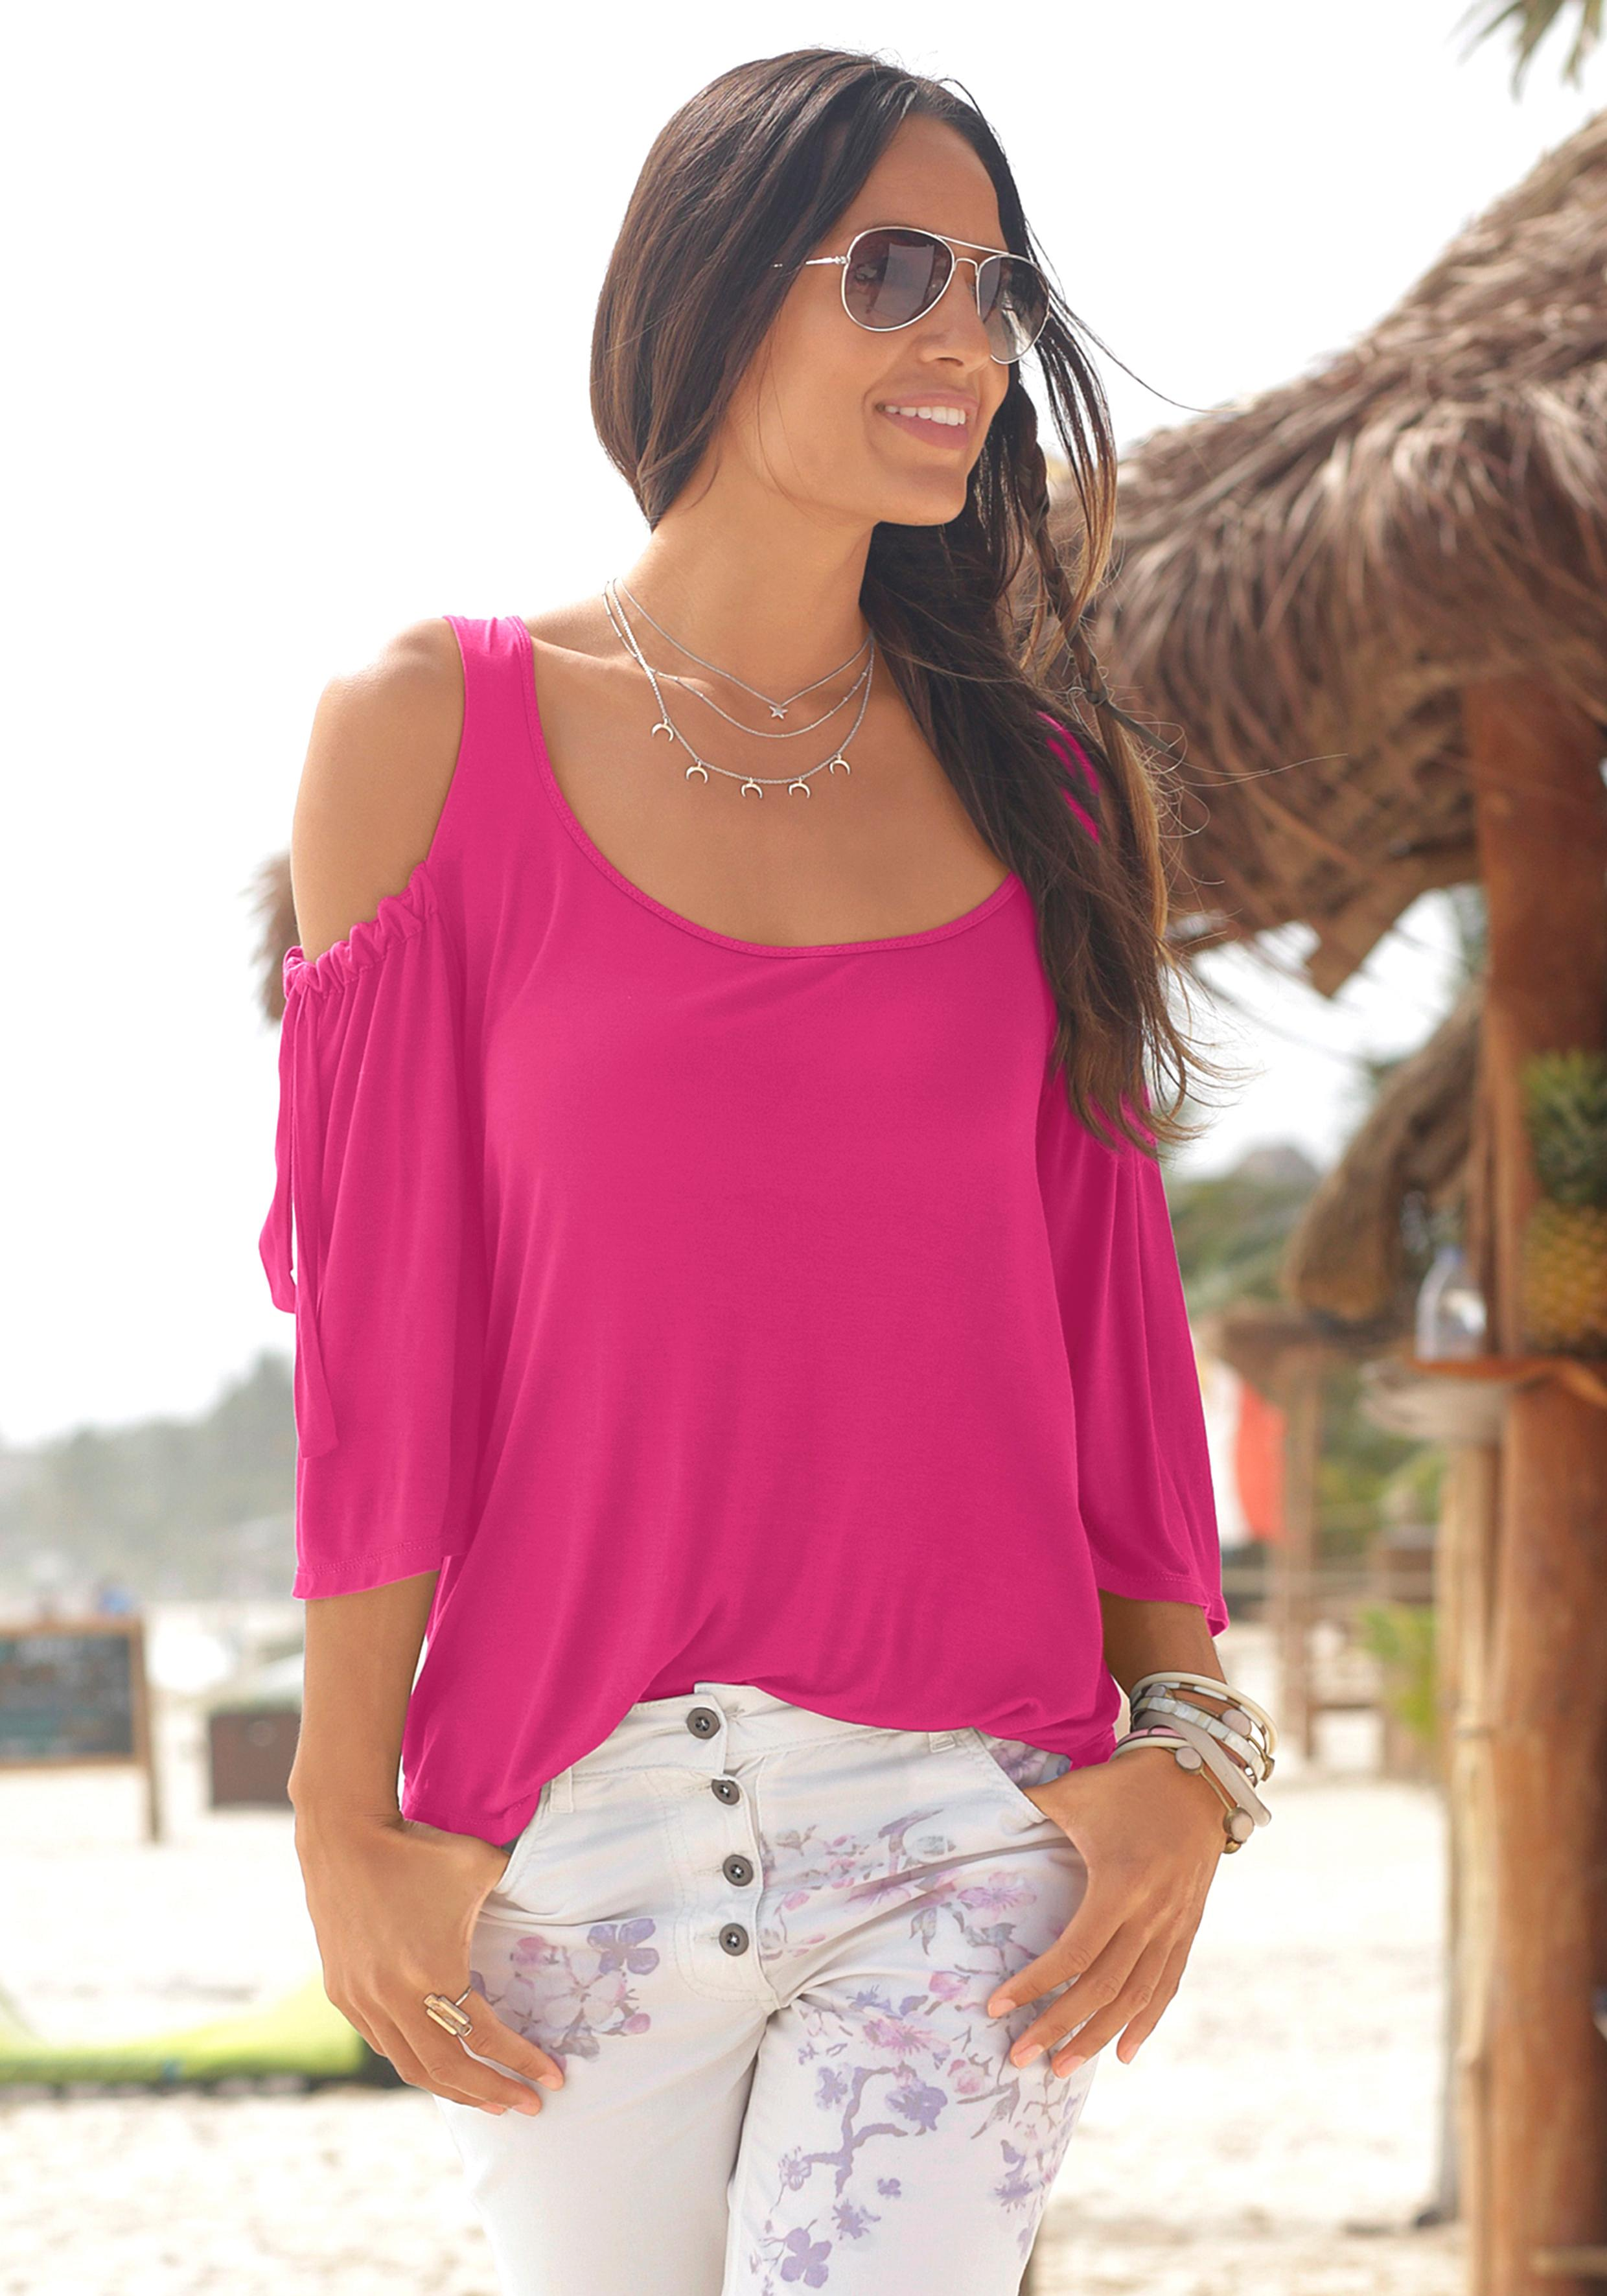 LASCANA Rundhalsshirt | Bekleidung > Shirts > Rundhalsshirts | Lascana